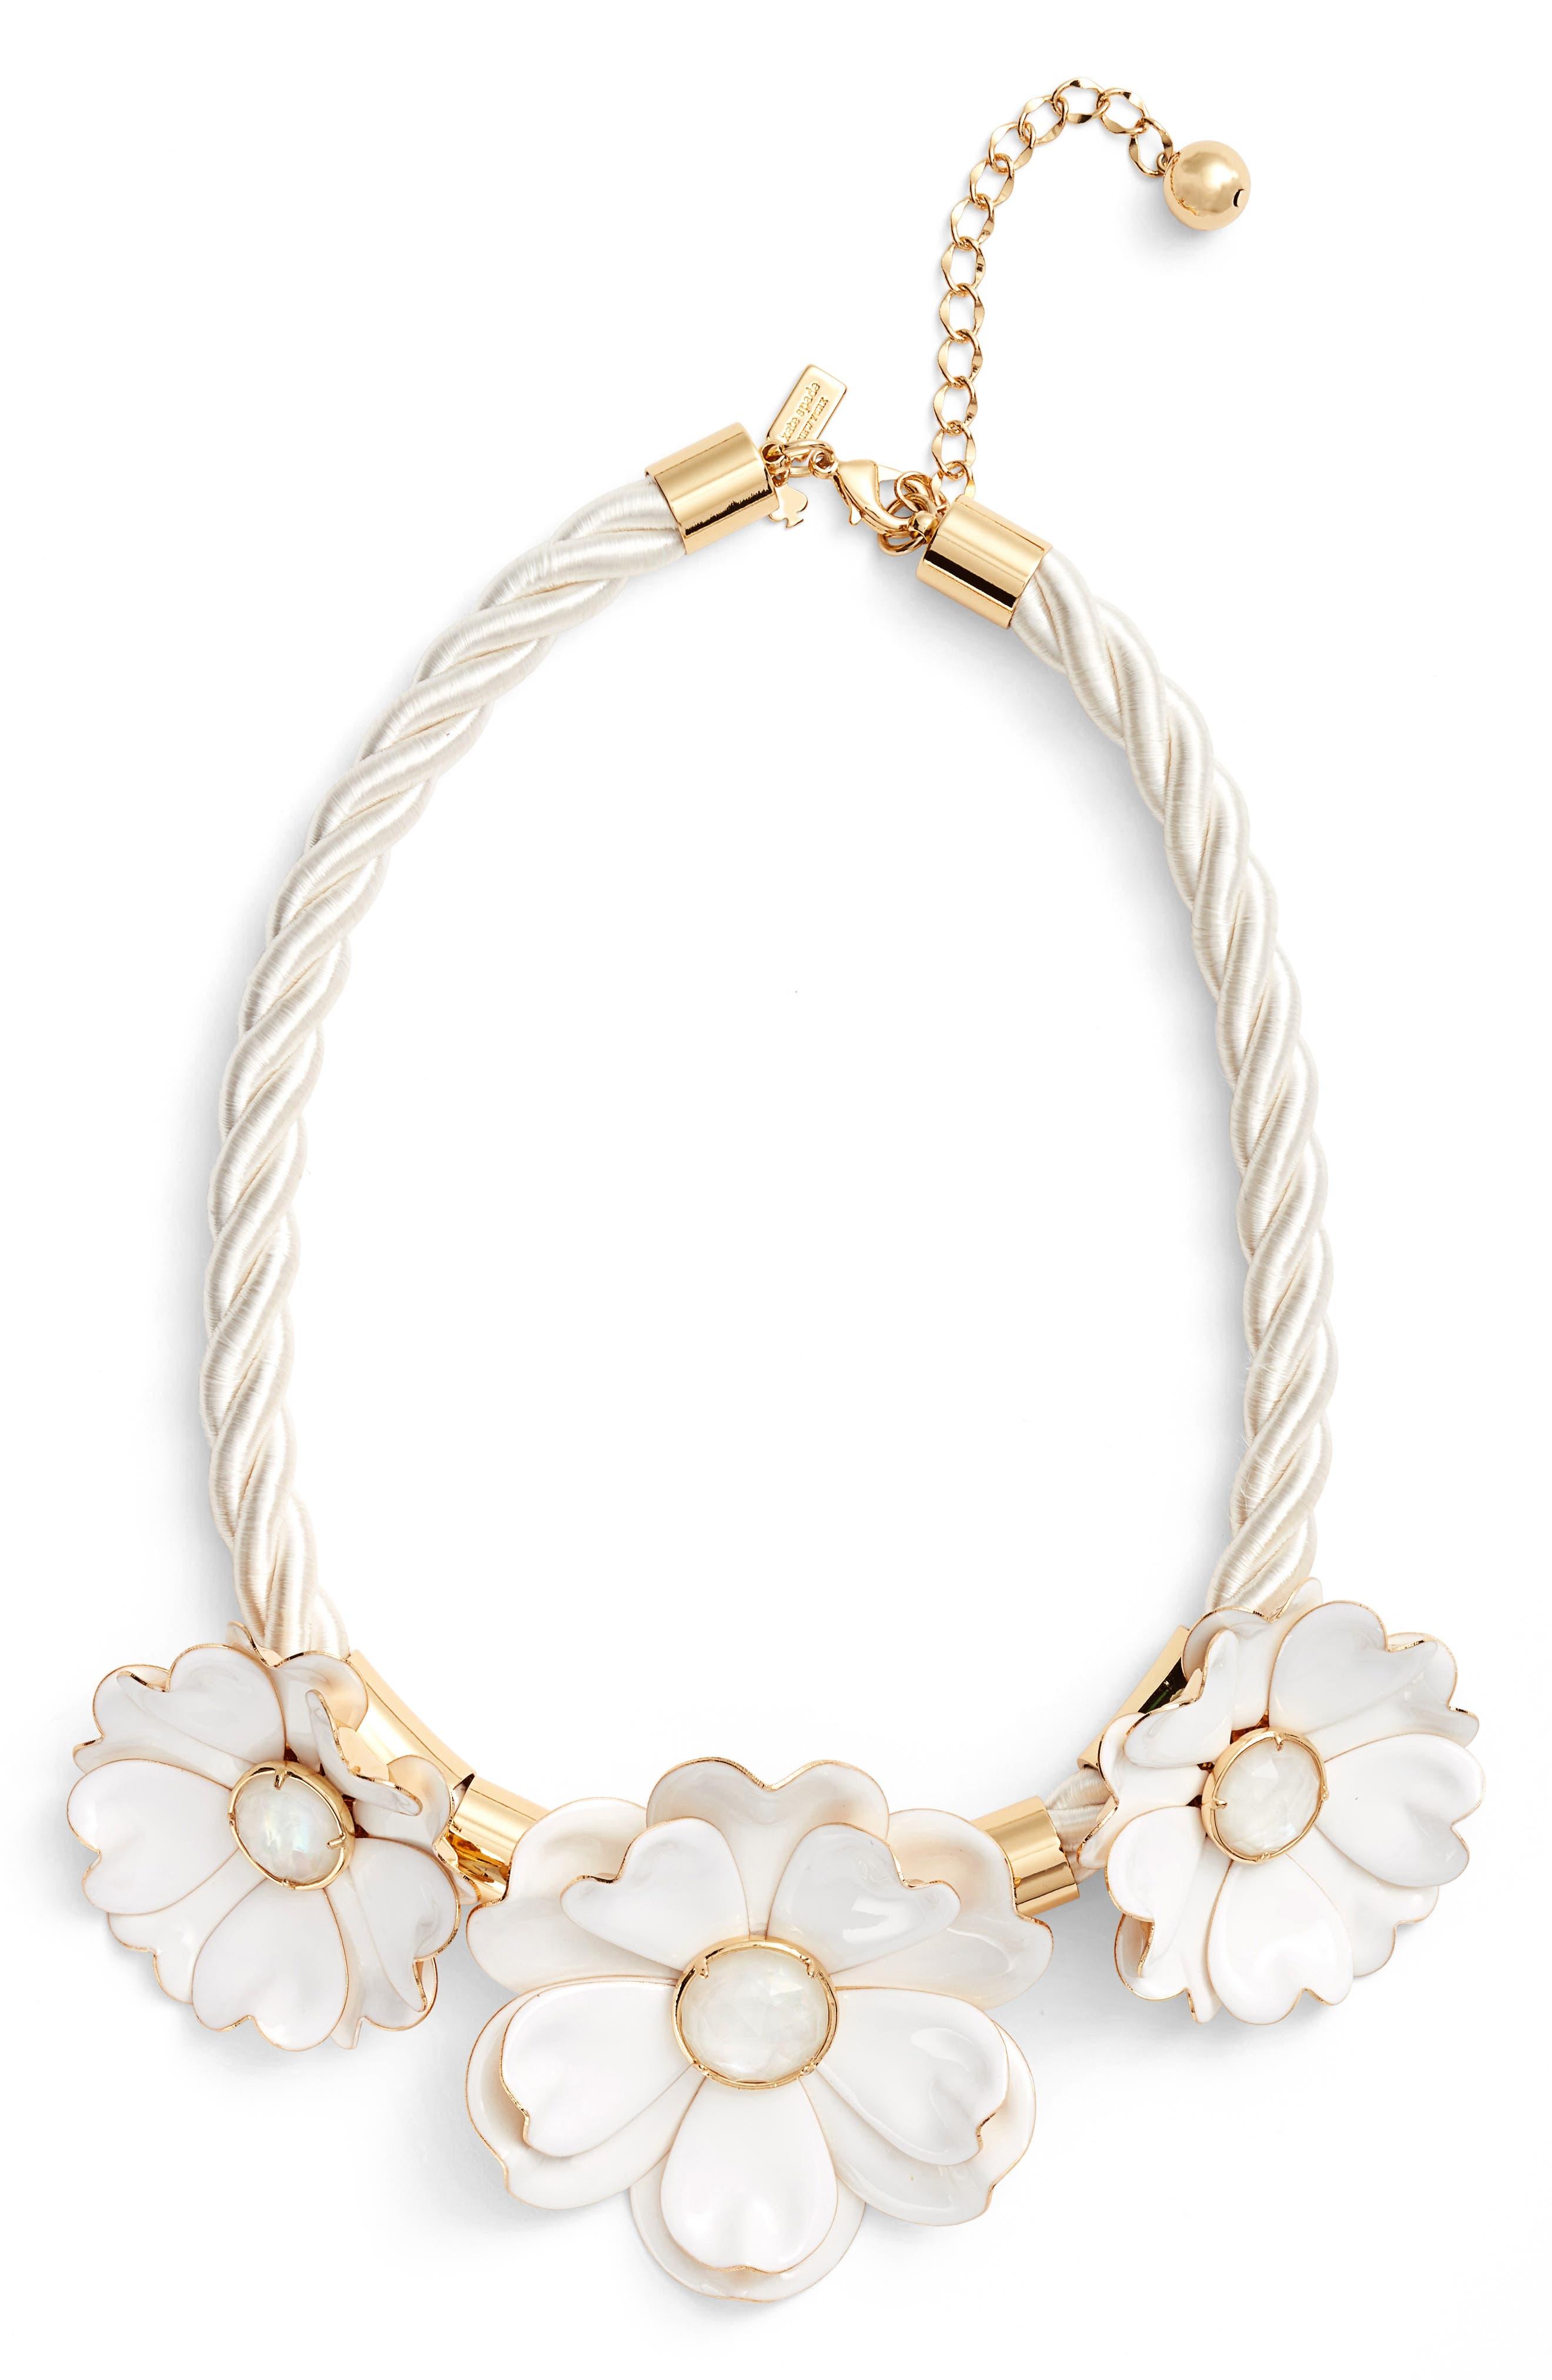 KATE SPADE NEW YORK bright blossom necklace